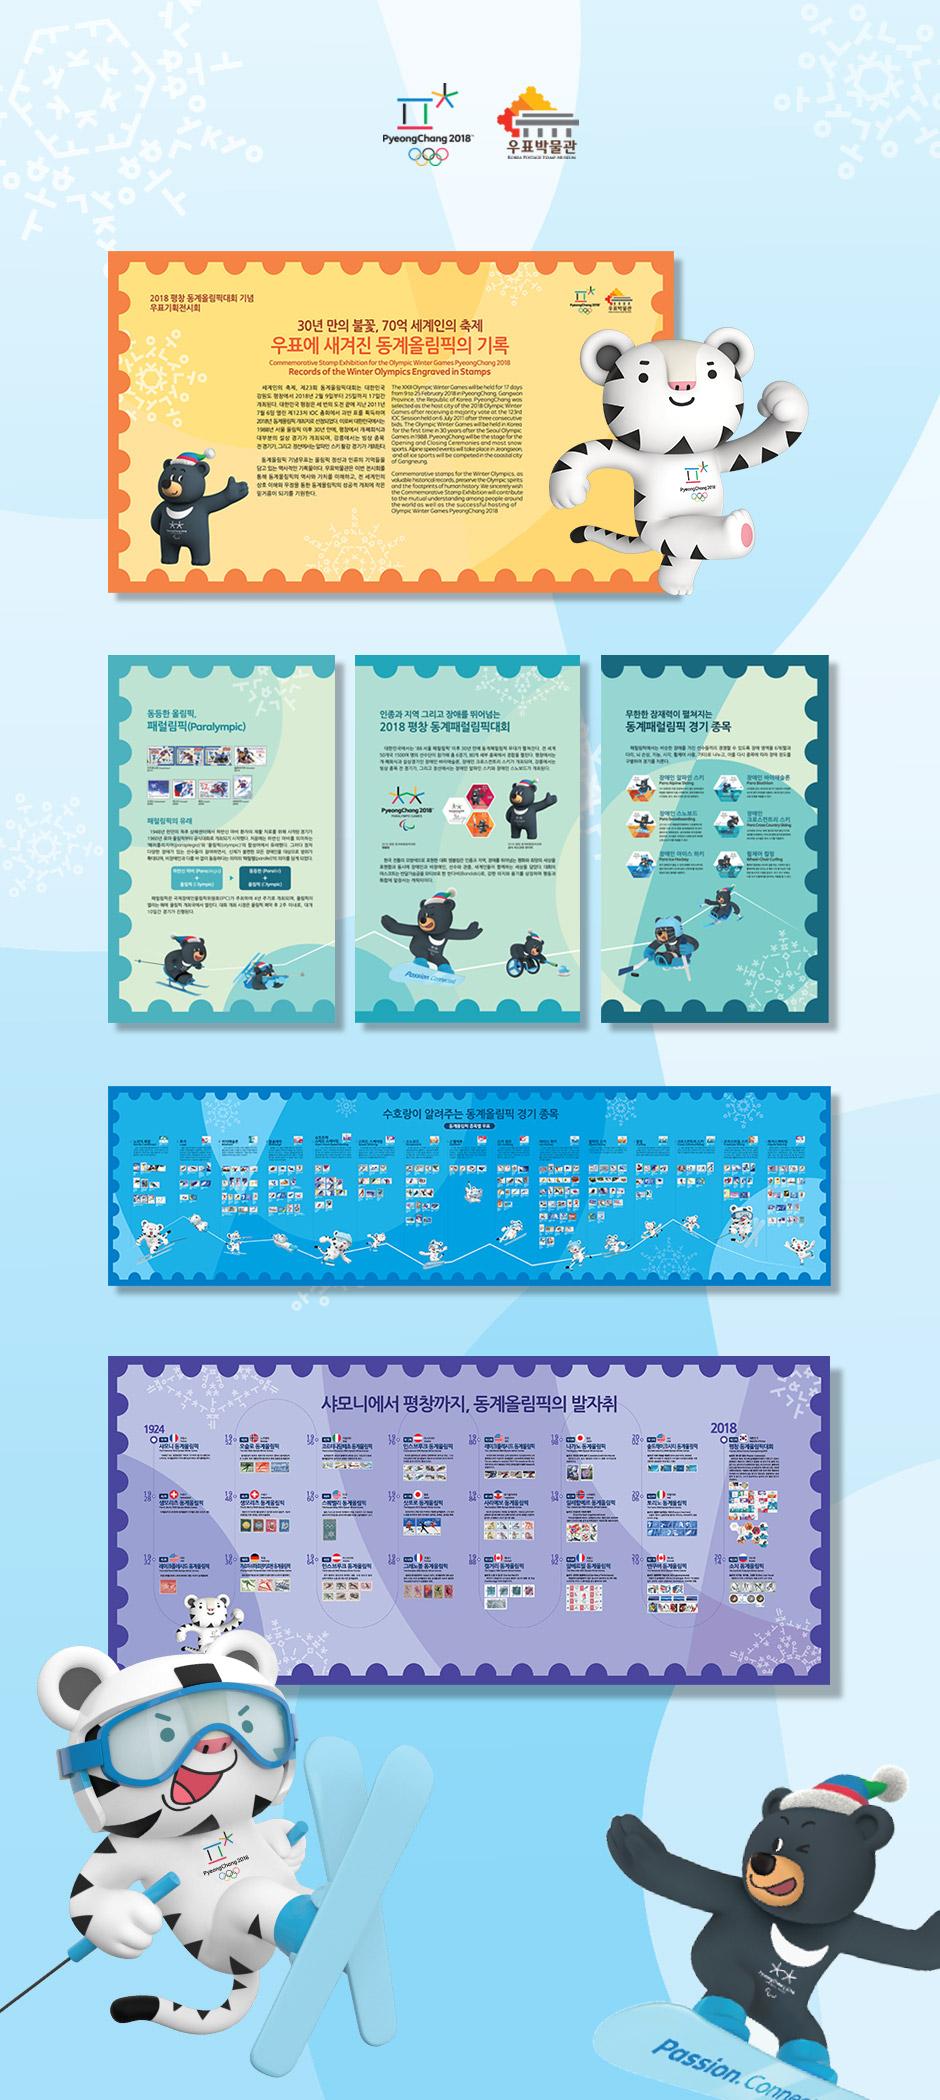 KOREA-POST-Olympic-Winter-Games-PyeongChang-stapm-exhibition-banner-design